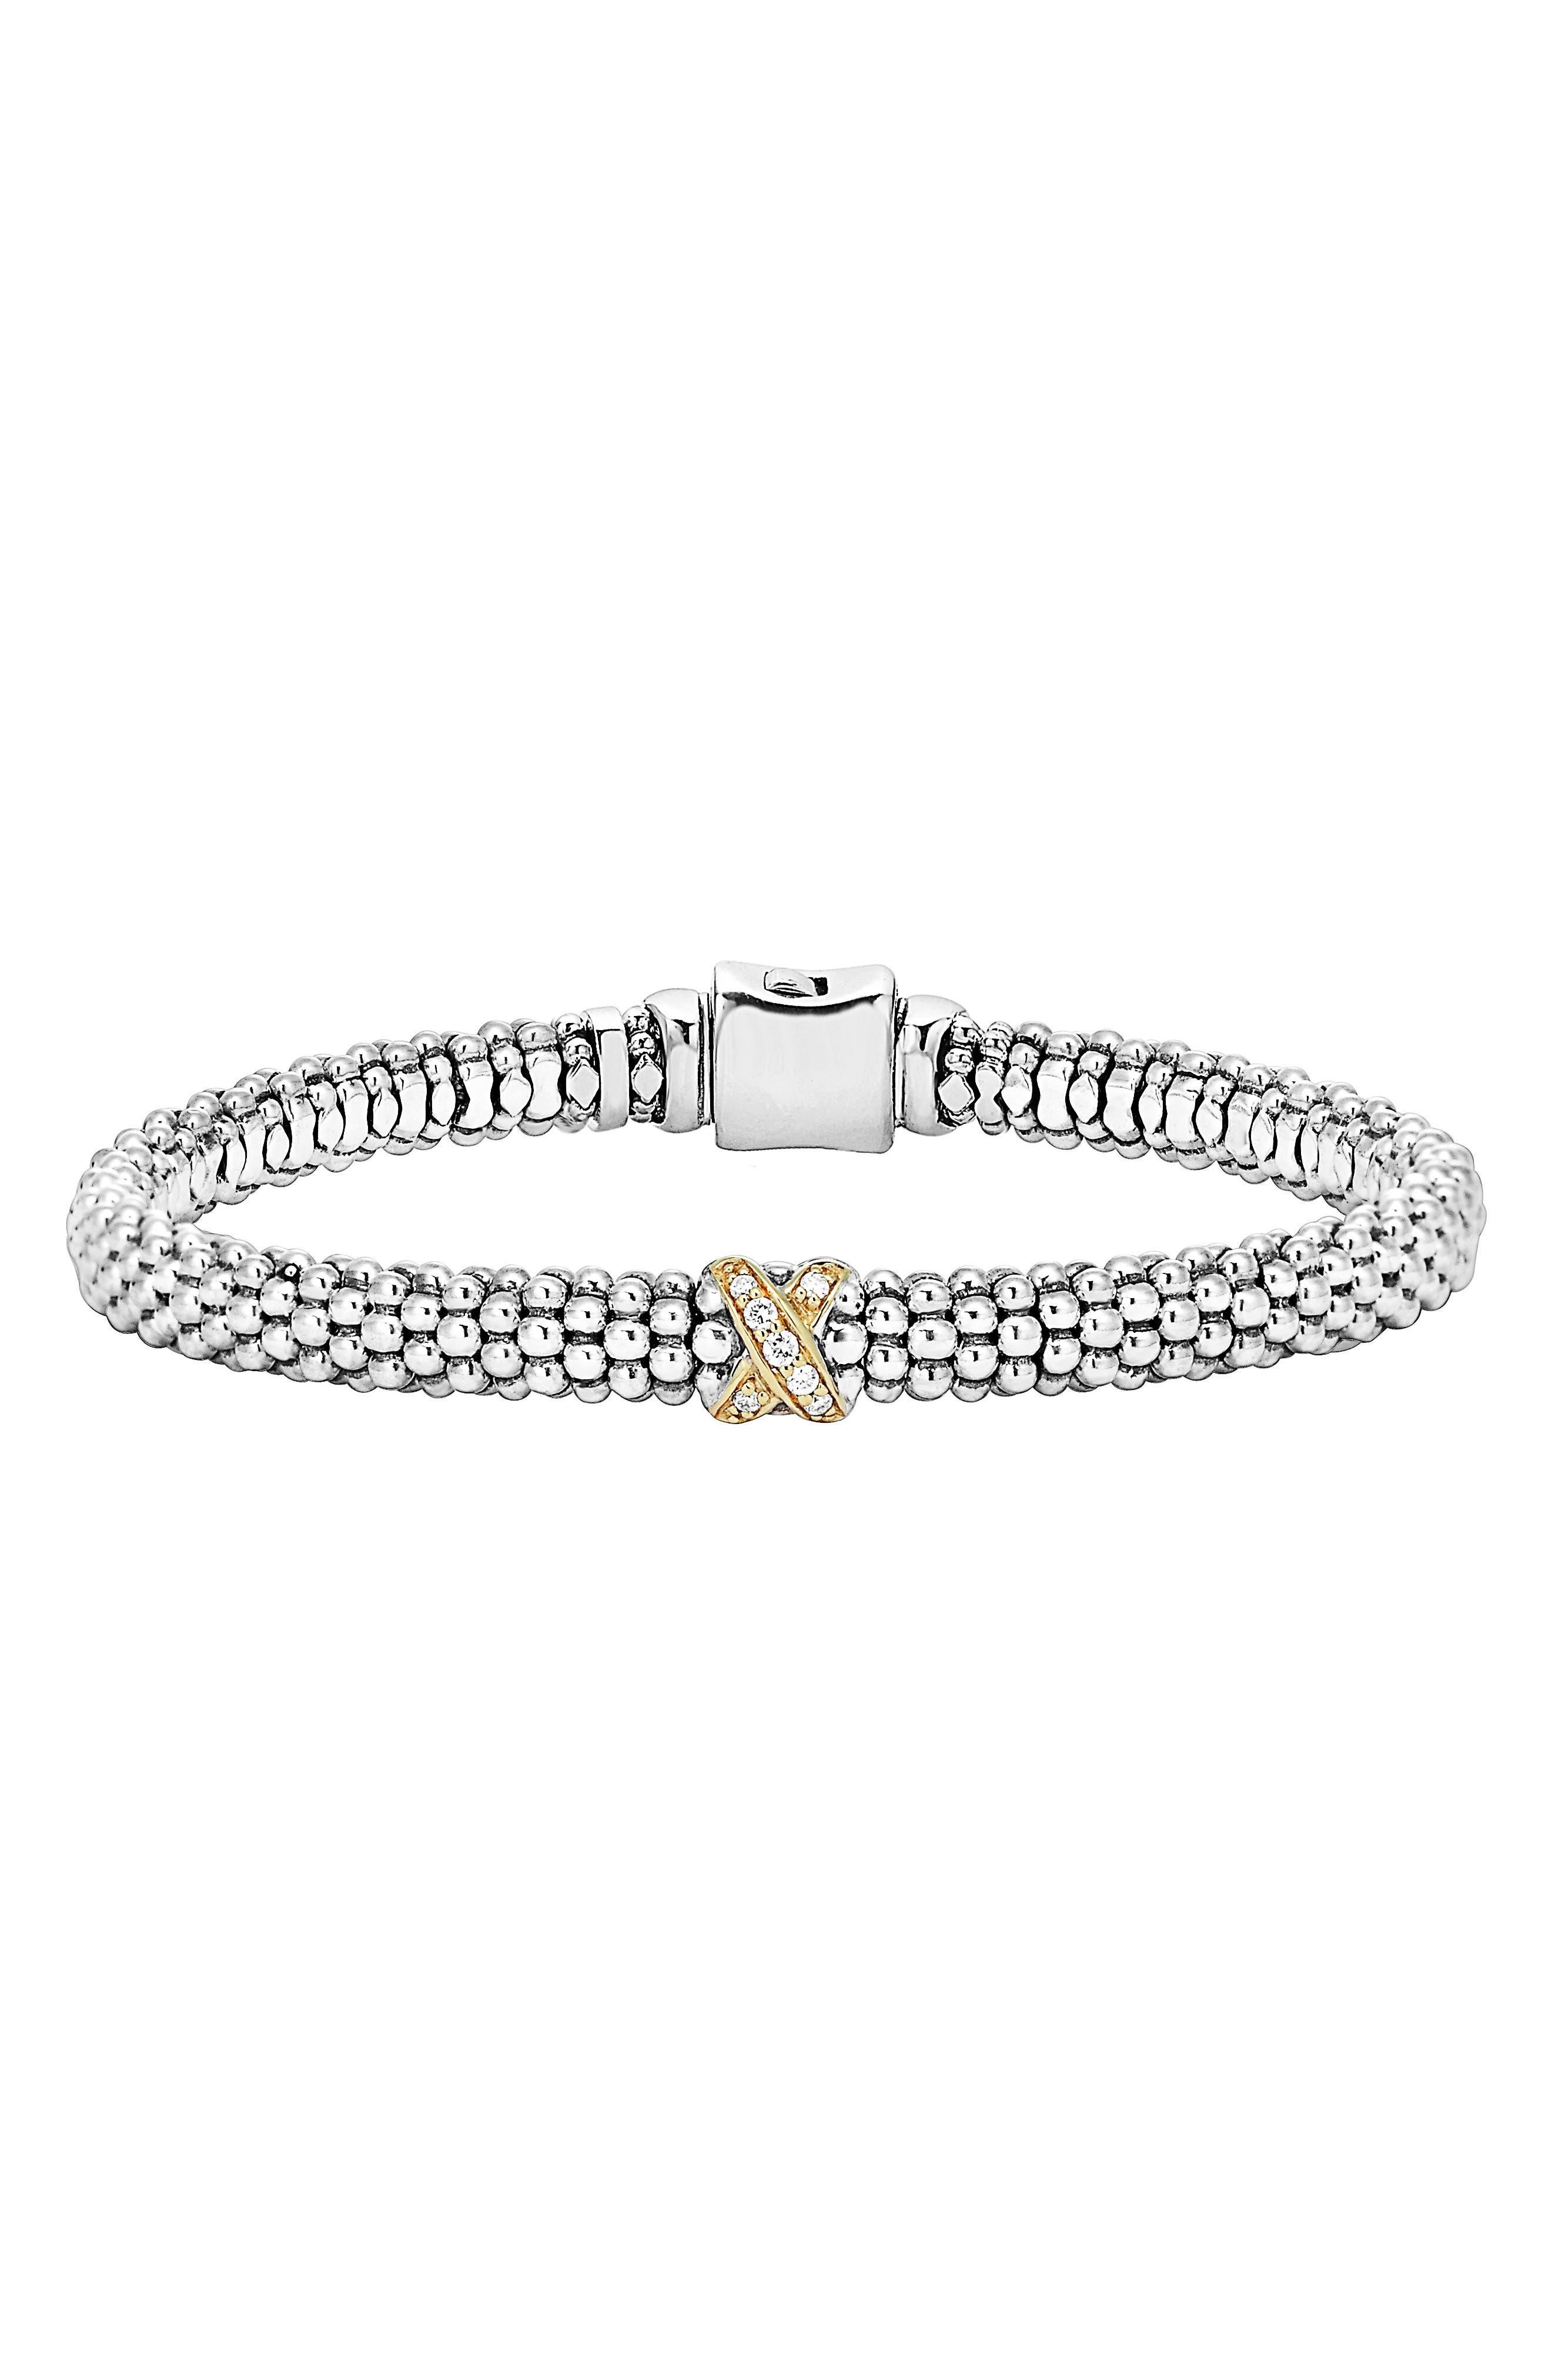 Caviar 'Signature Caviar' Diamond Rope Bracelet,                             Main thumbnail 1, color,                             STERLING SILVER/ GOLD